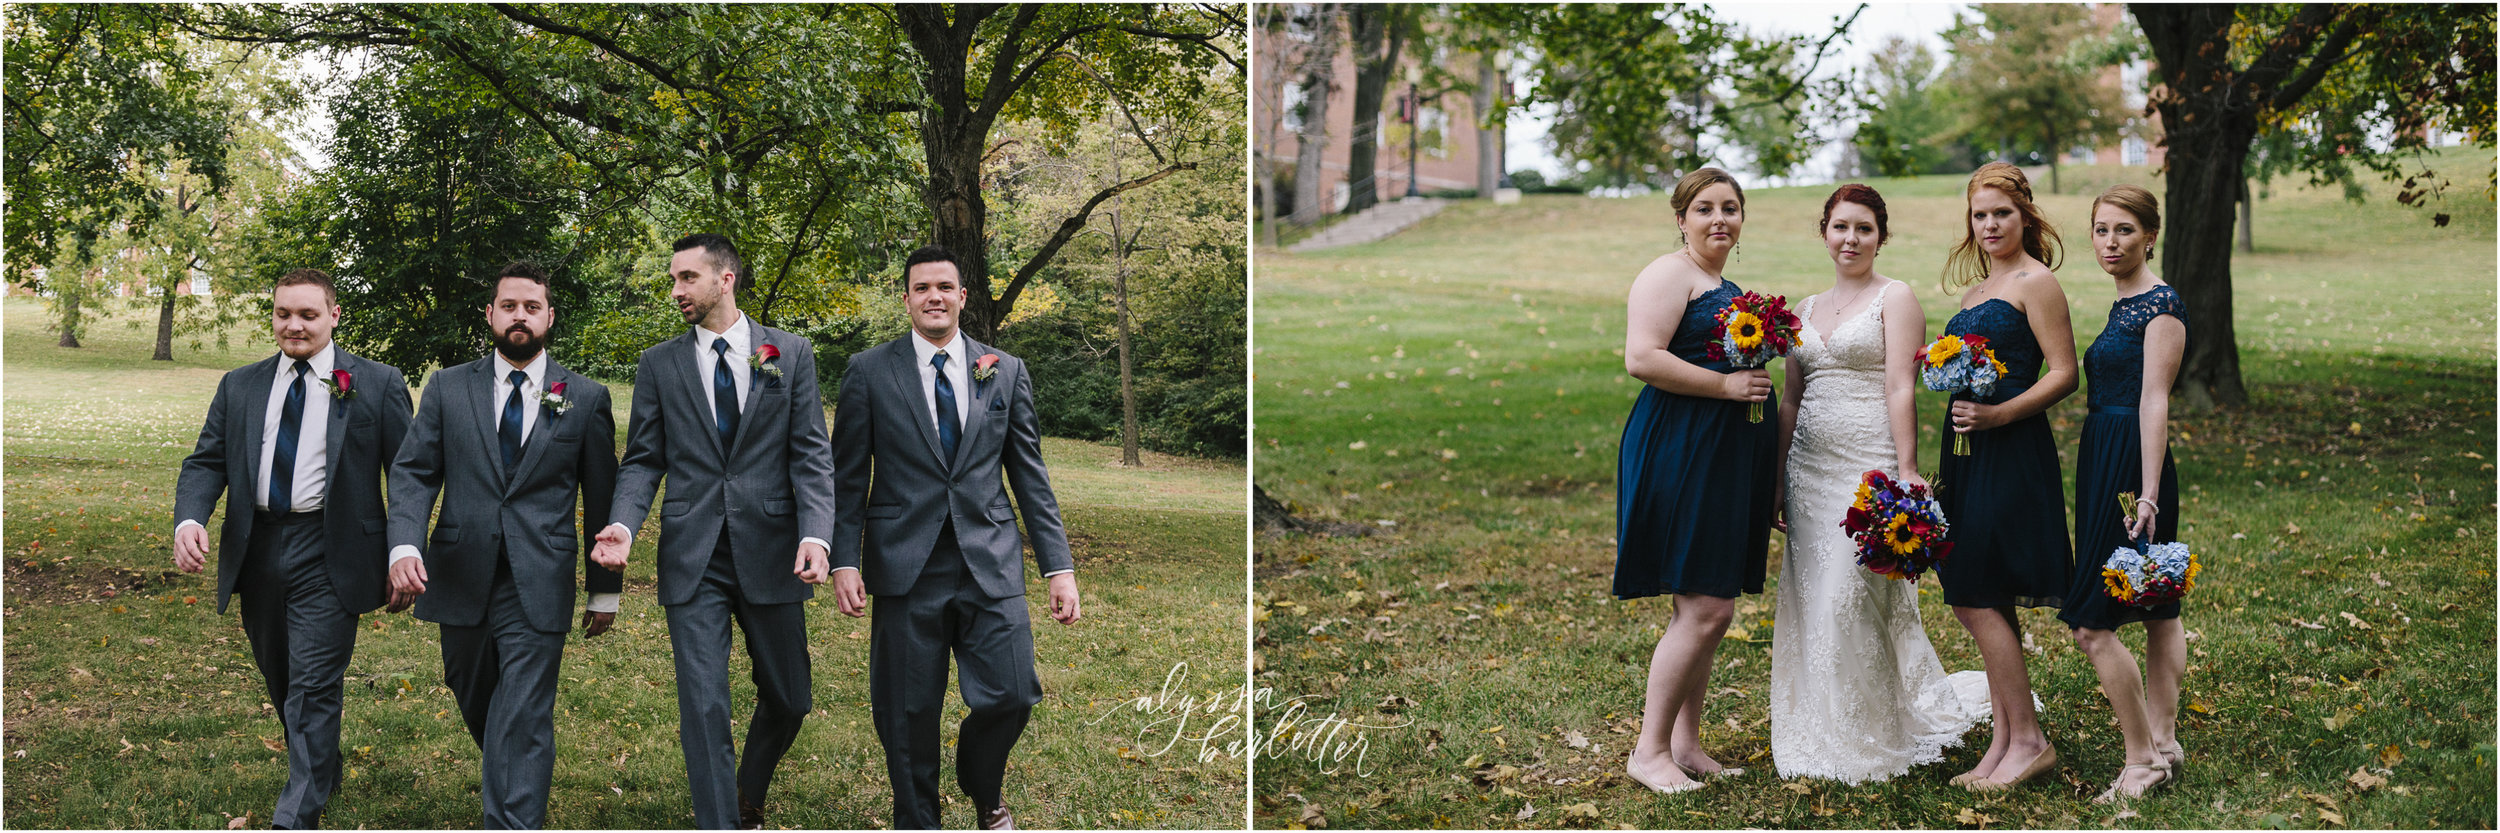 alyssa barletter photography wedding party photos-1-2.jpg